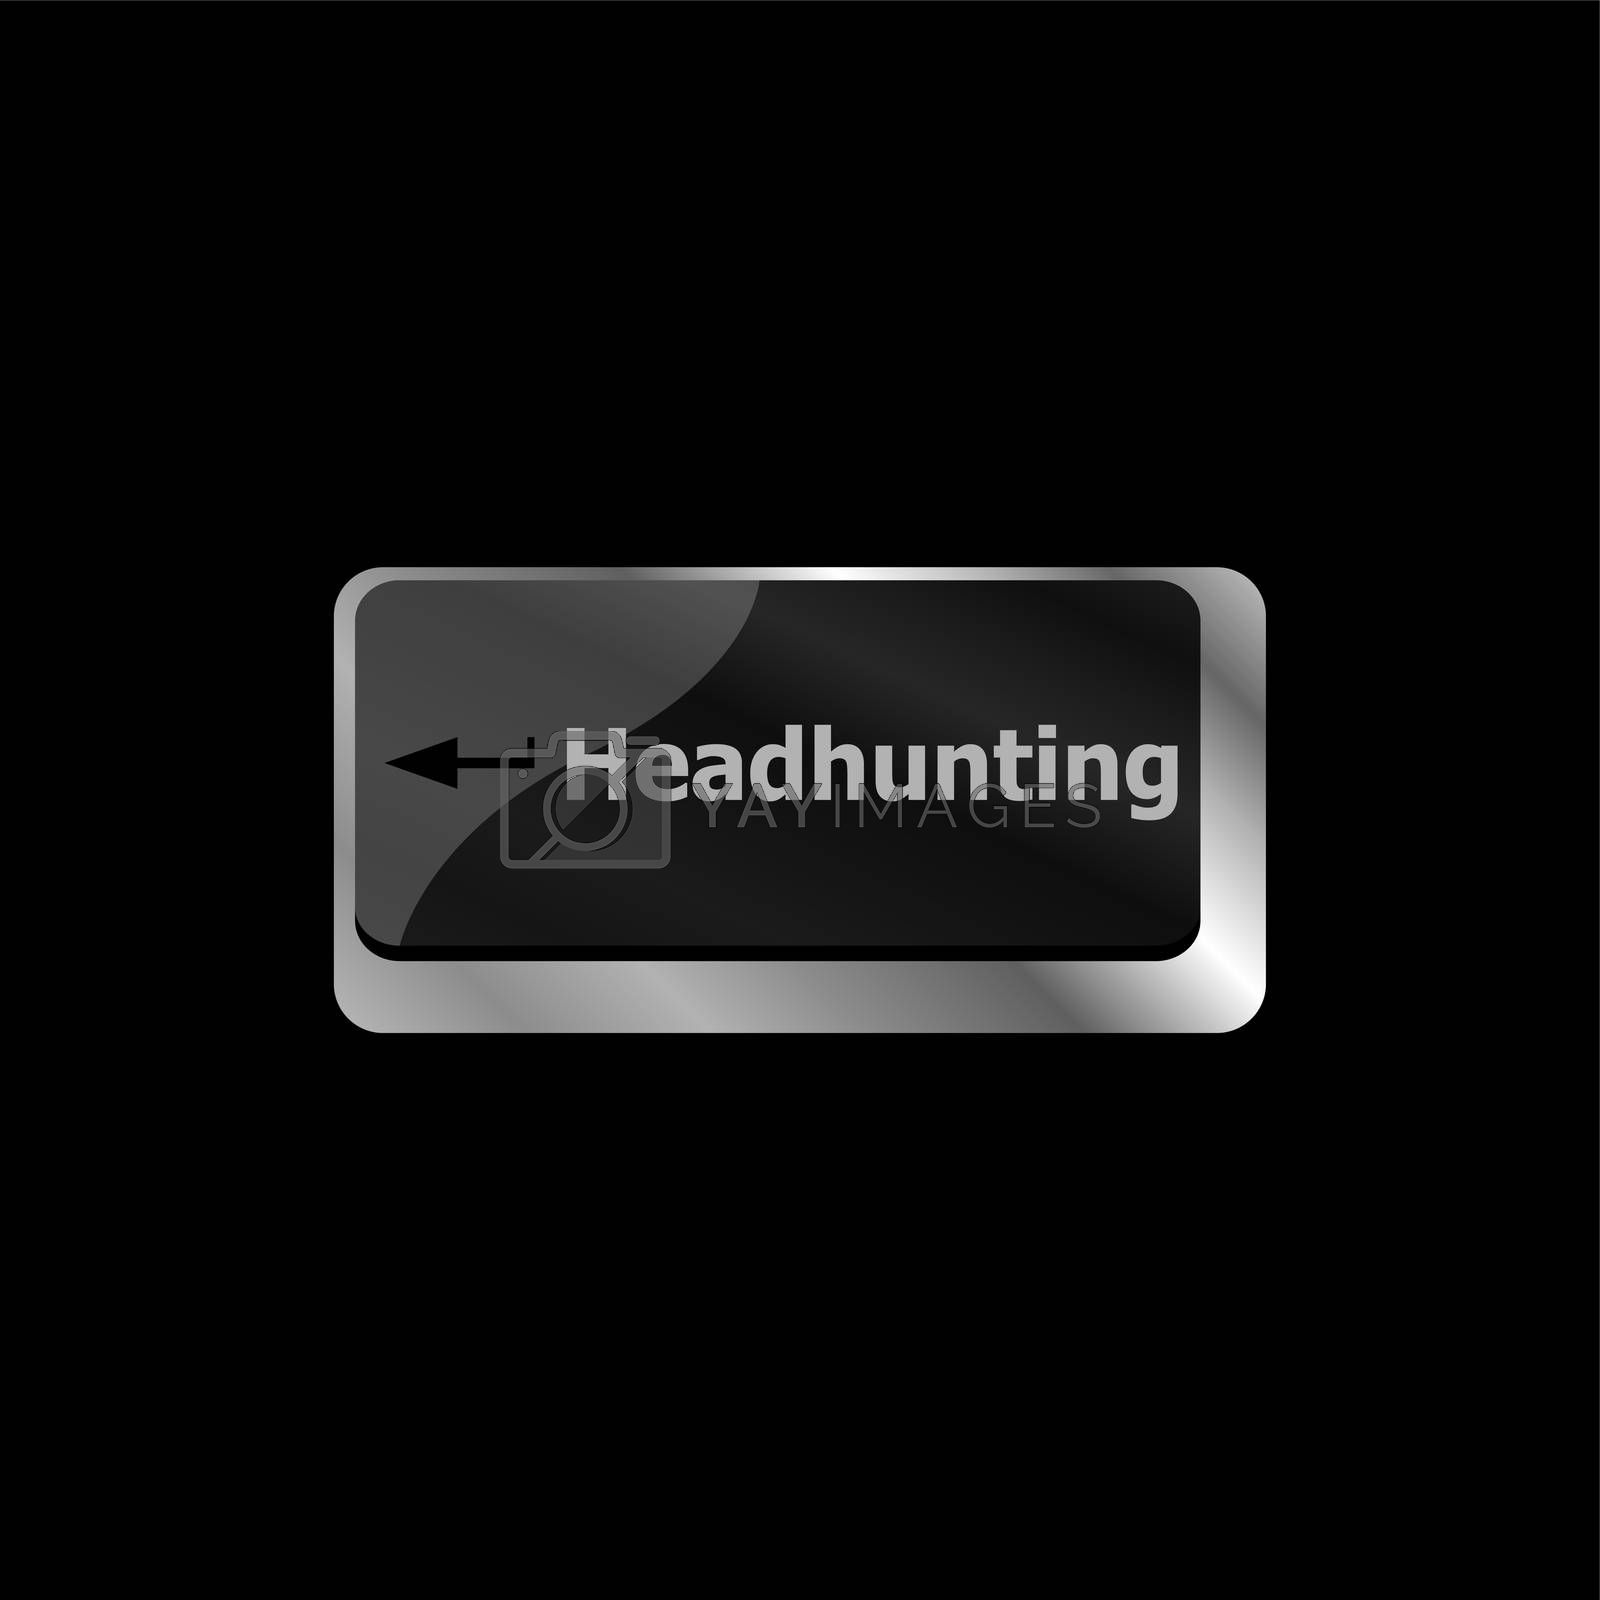 Headhunting . Job concept. Computer keyboard key button